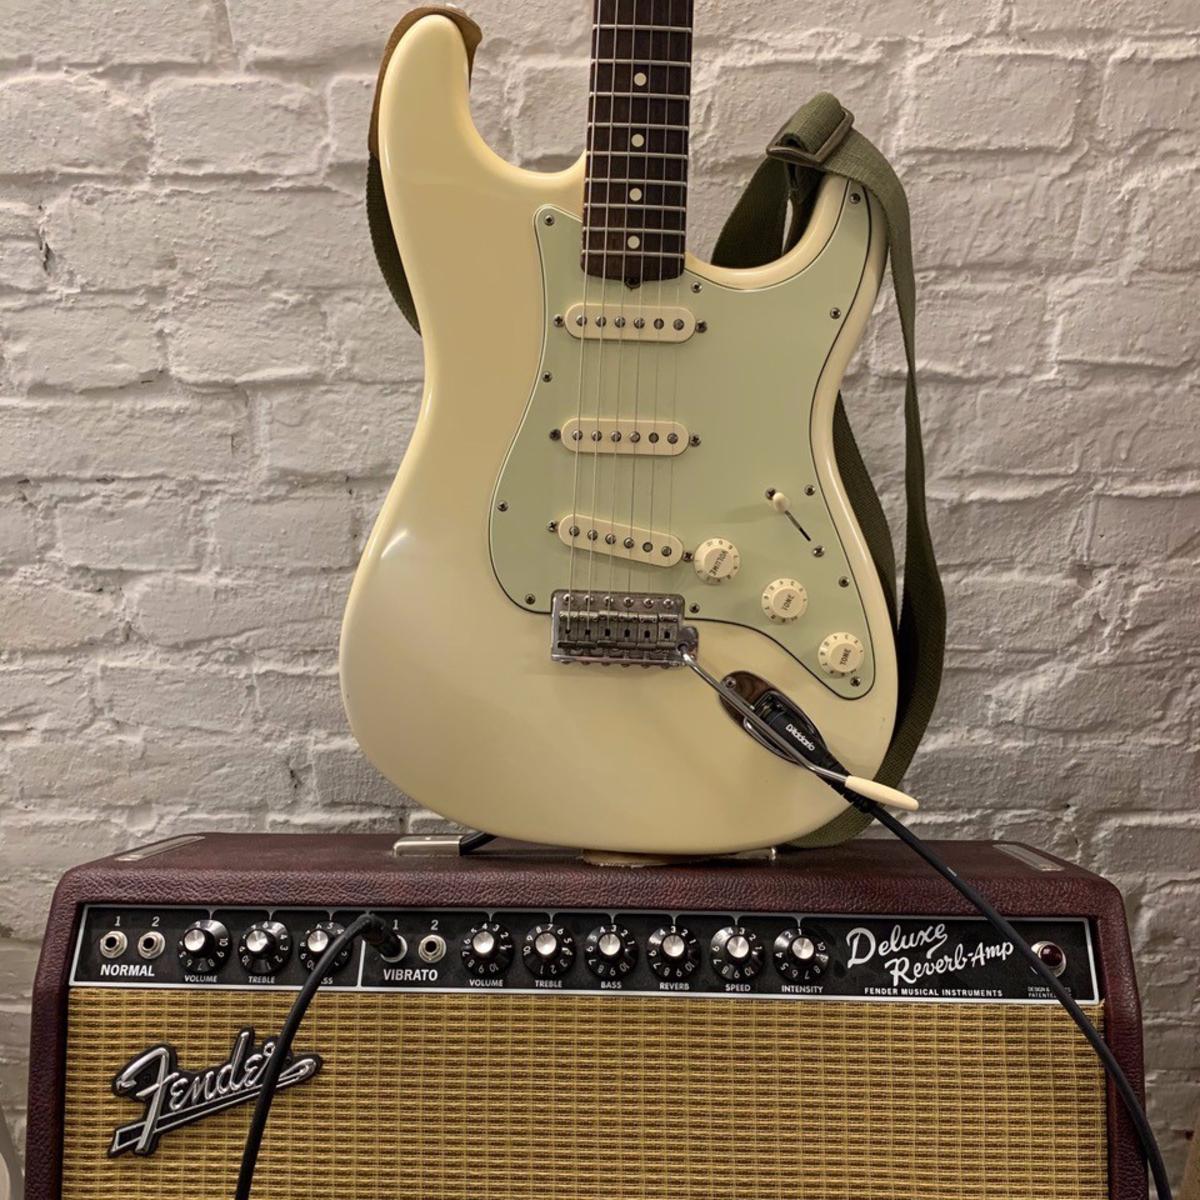 Fender Strat and amp